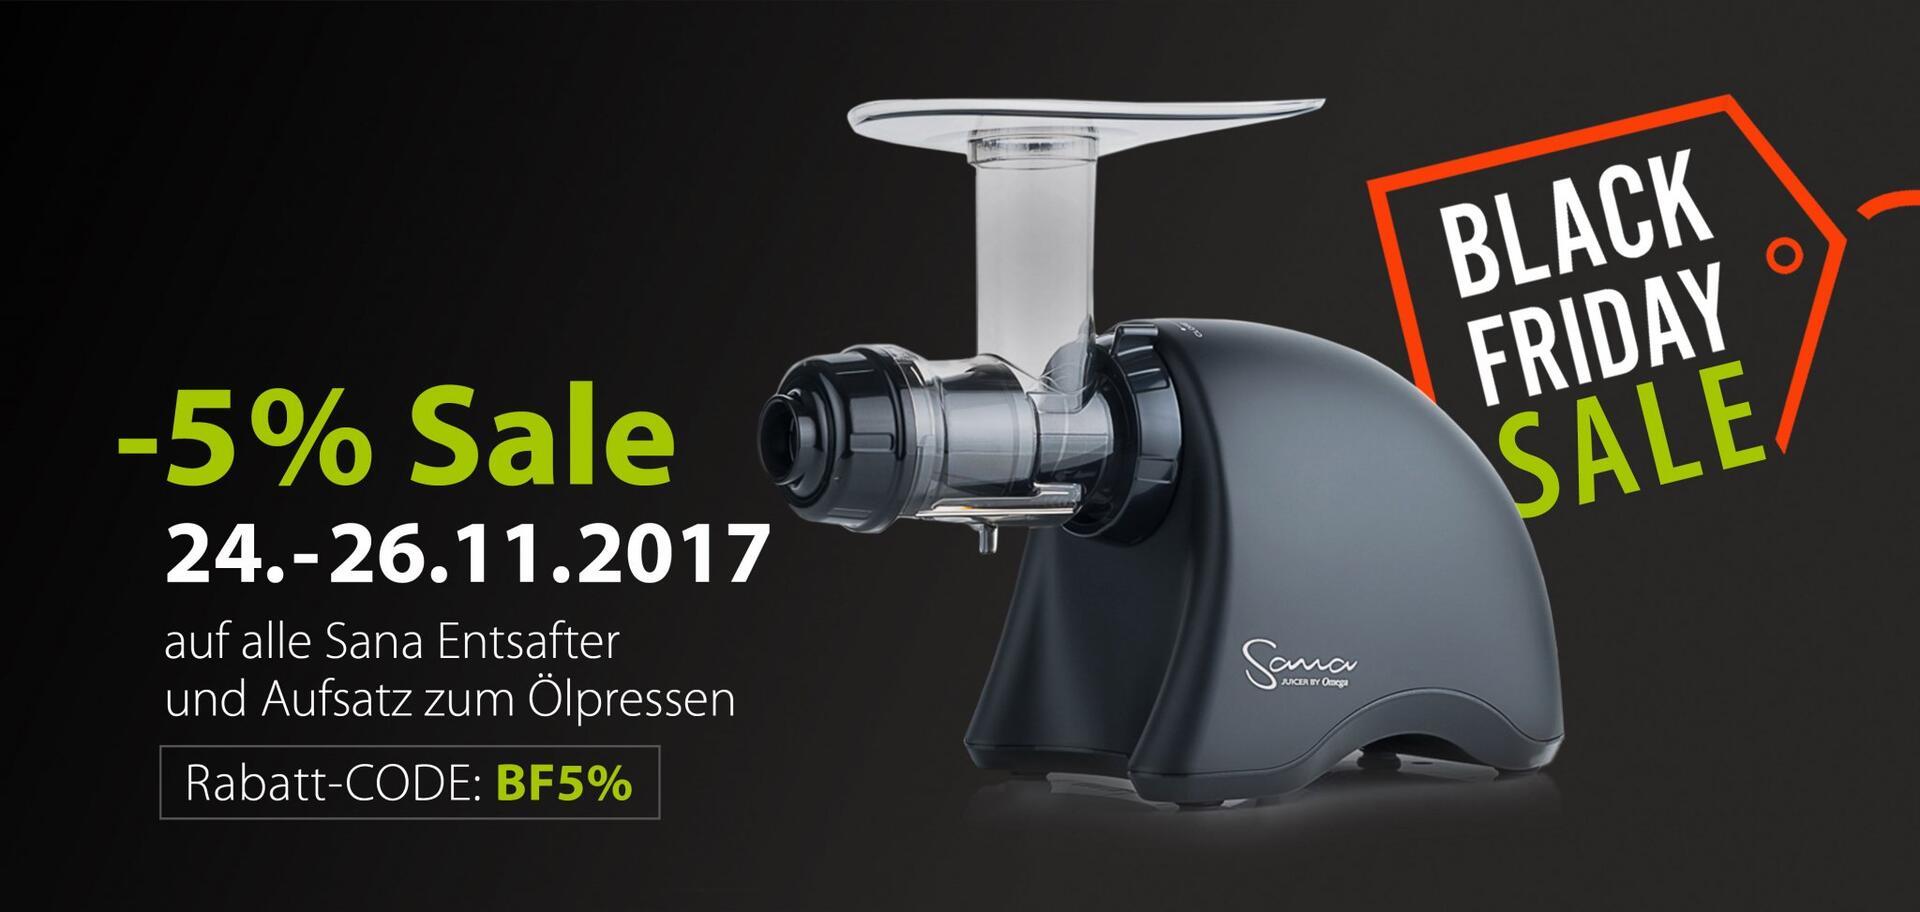 Black Friday Sale 2017 | EUJUICERS.DE